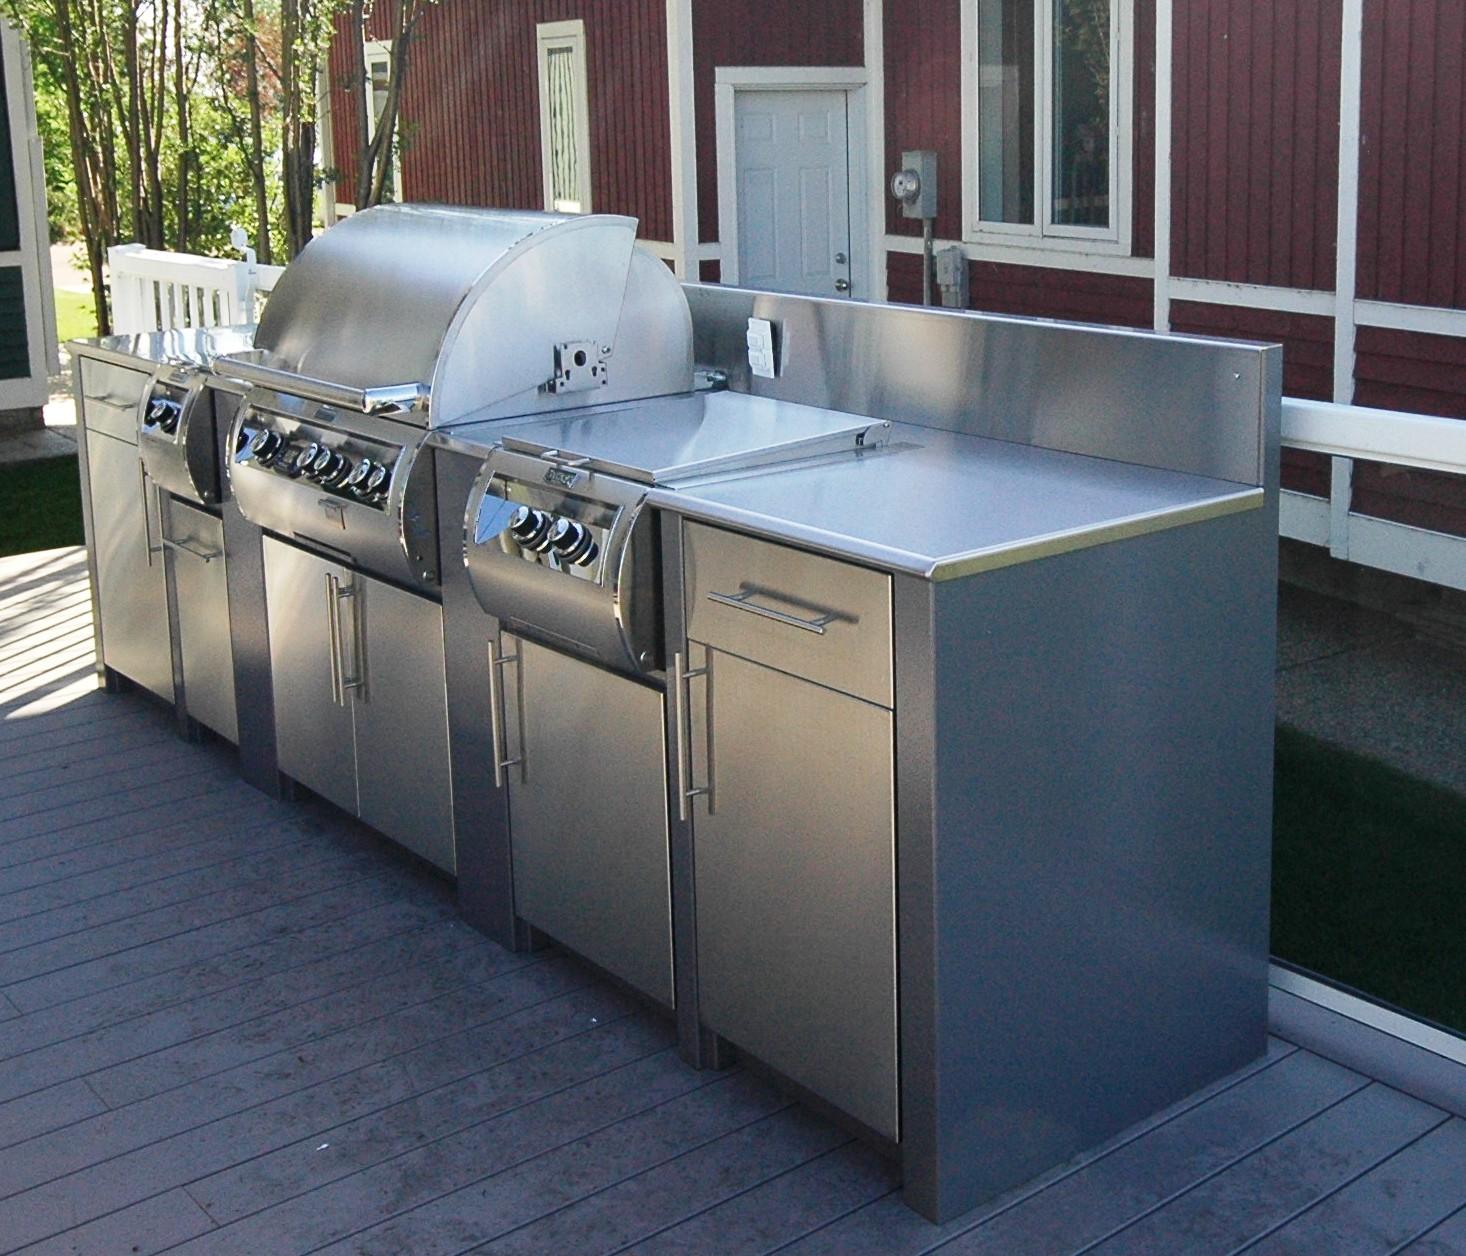 Best Kitchen Gallery: Stainless Steel Outdoor Kitchens Steelkitchen of Stainless Steel Outdoor Kitchen Cabinets on rachelxblog.com